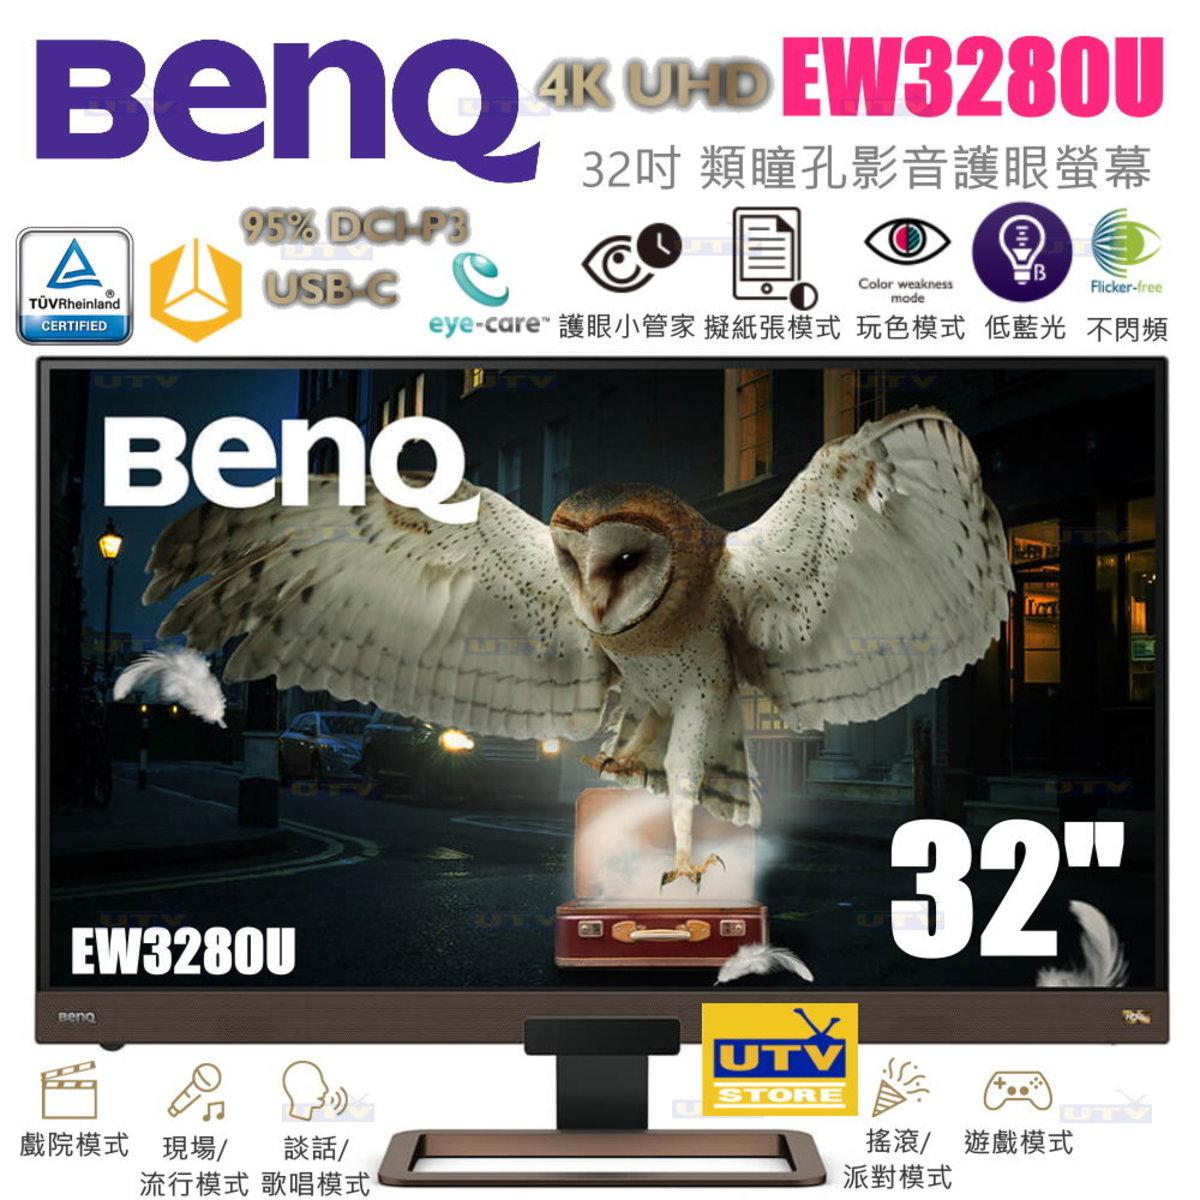 "EW3280U 32"" pupil-like audio-visual eye protection screen"